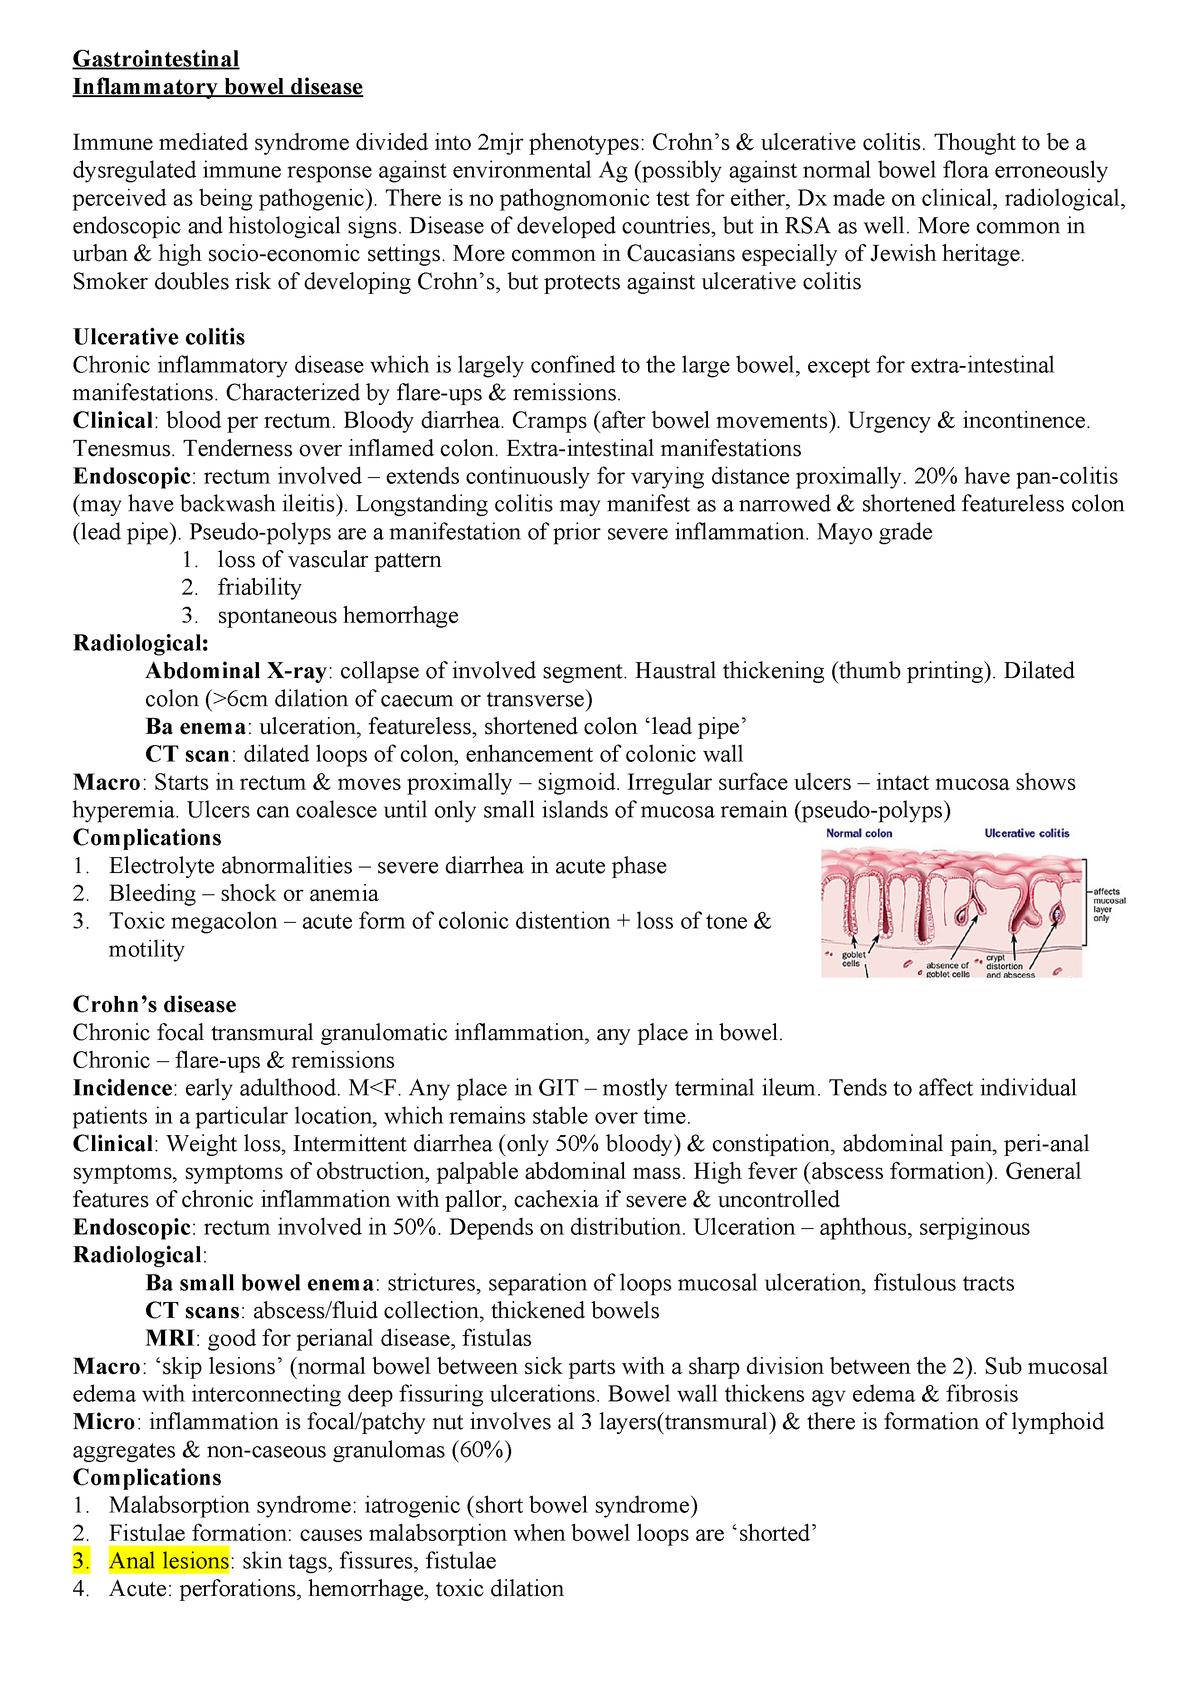 Gastroenterology - Summary Medicine - MBChB - StuDocu